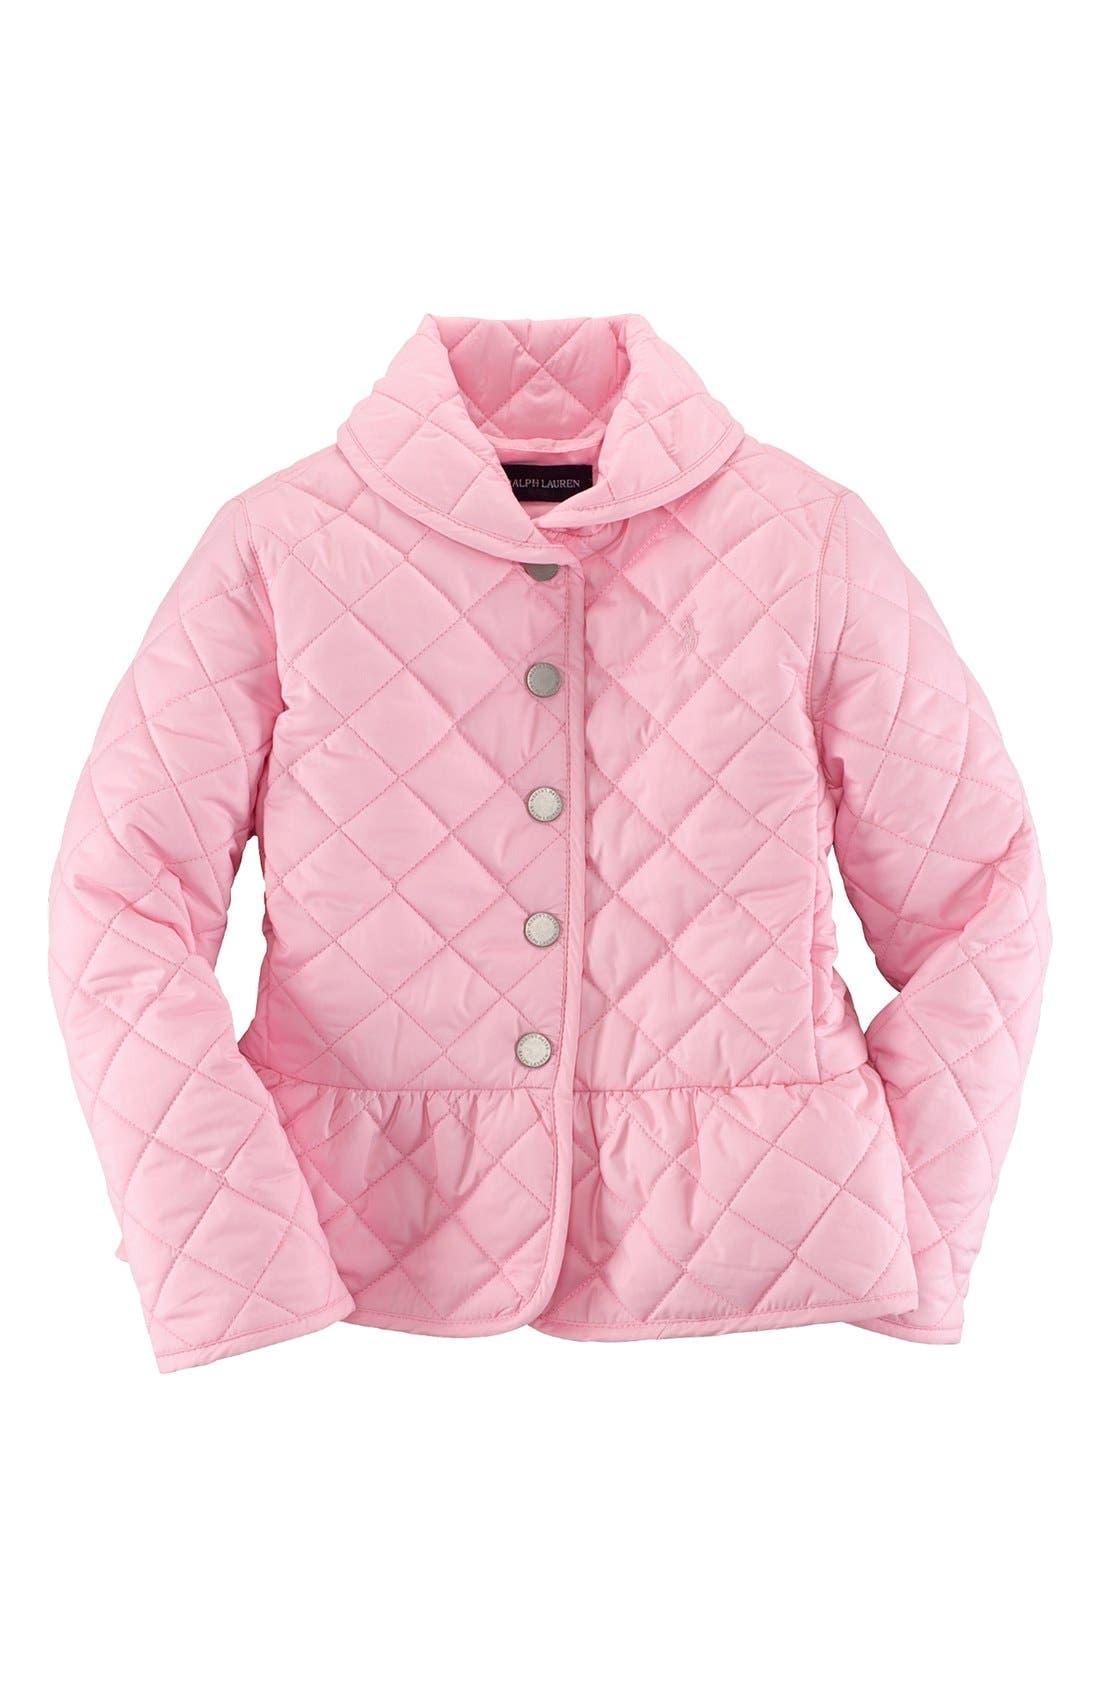 Main Image - Ralph Lauren Quilted Peplum Jacket (Toddler Girls)